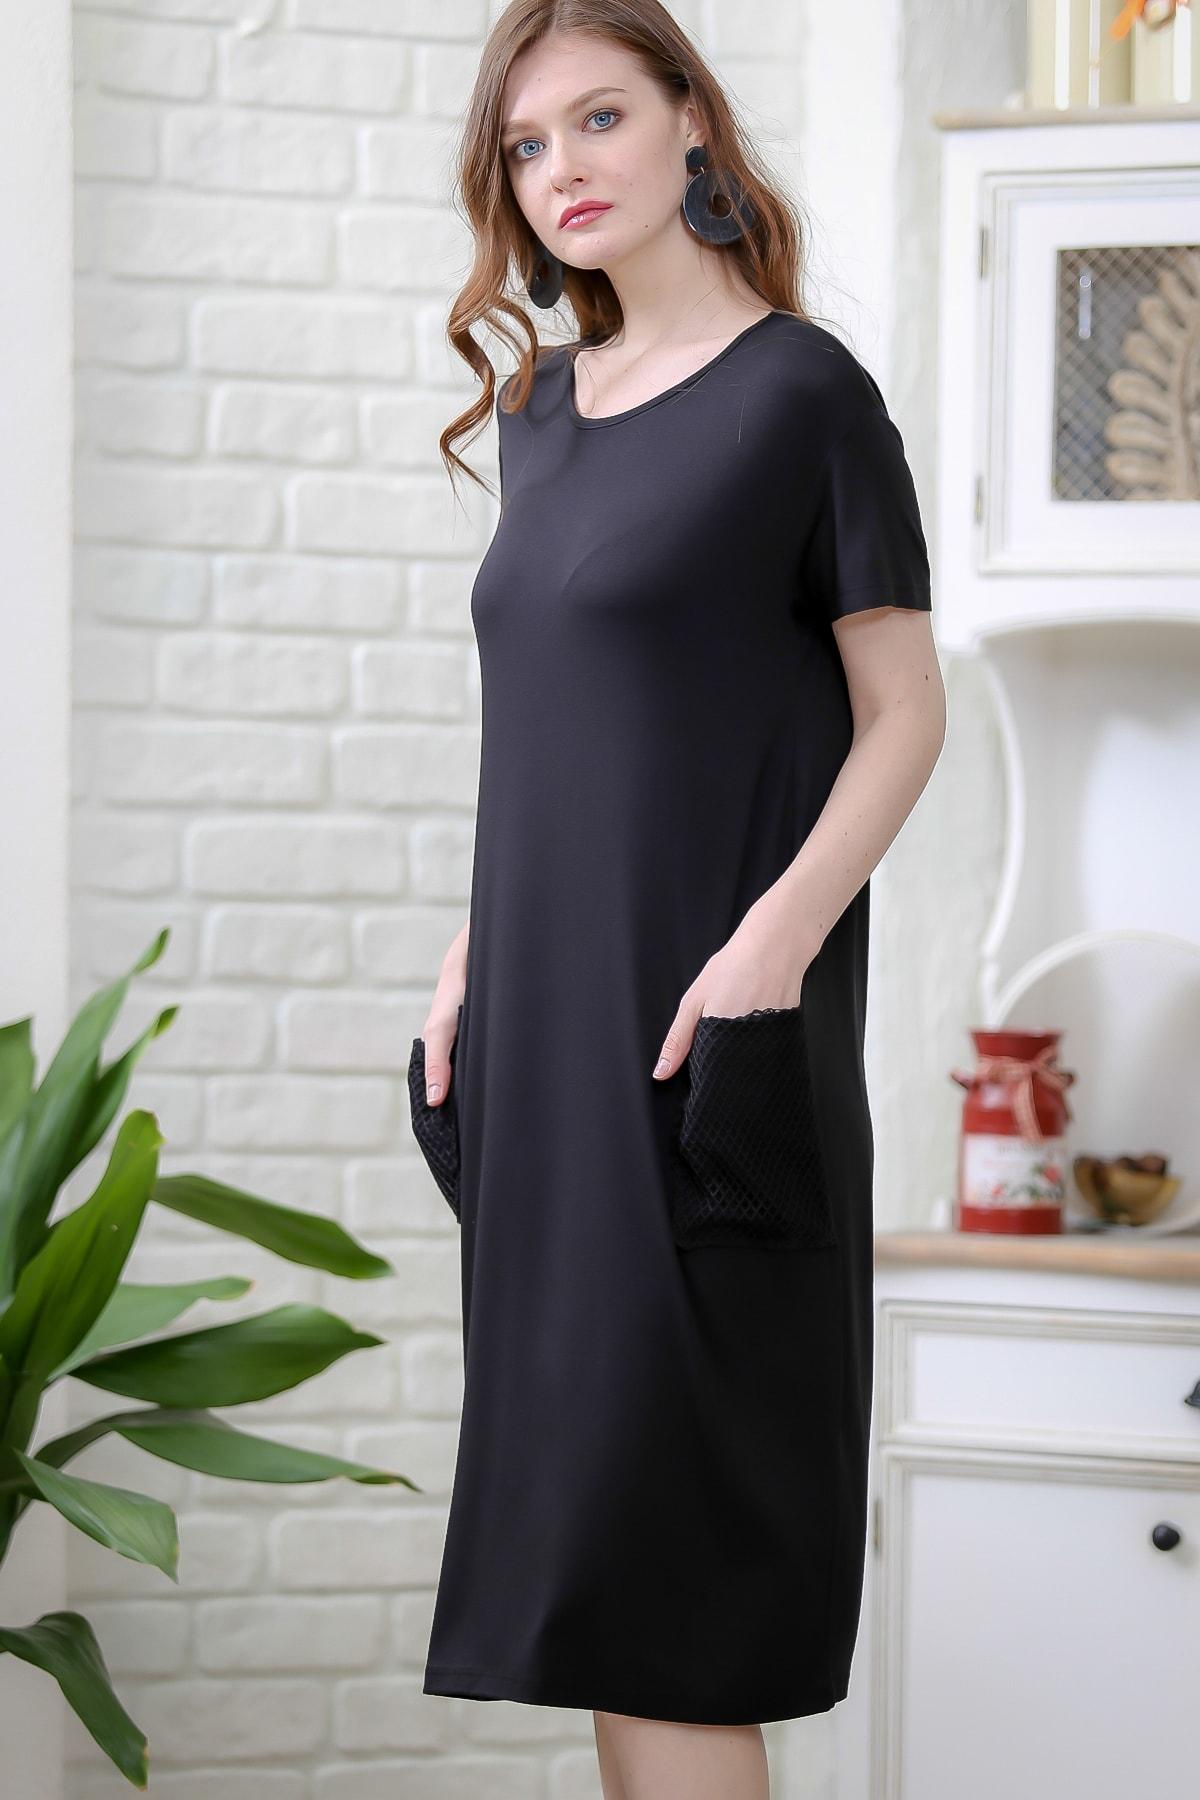 Chiccy Kadın Siyah Retro File Cep Detaylı Kısa Kollu Salaş Elbise M10160000EL97336 2